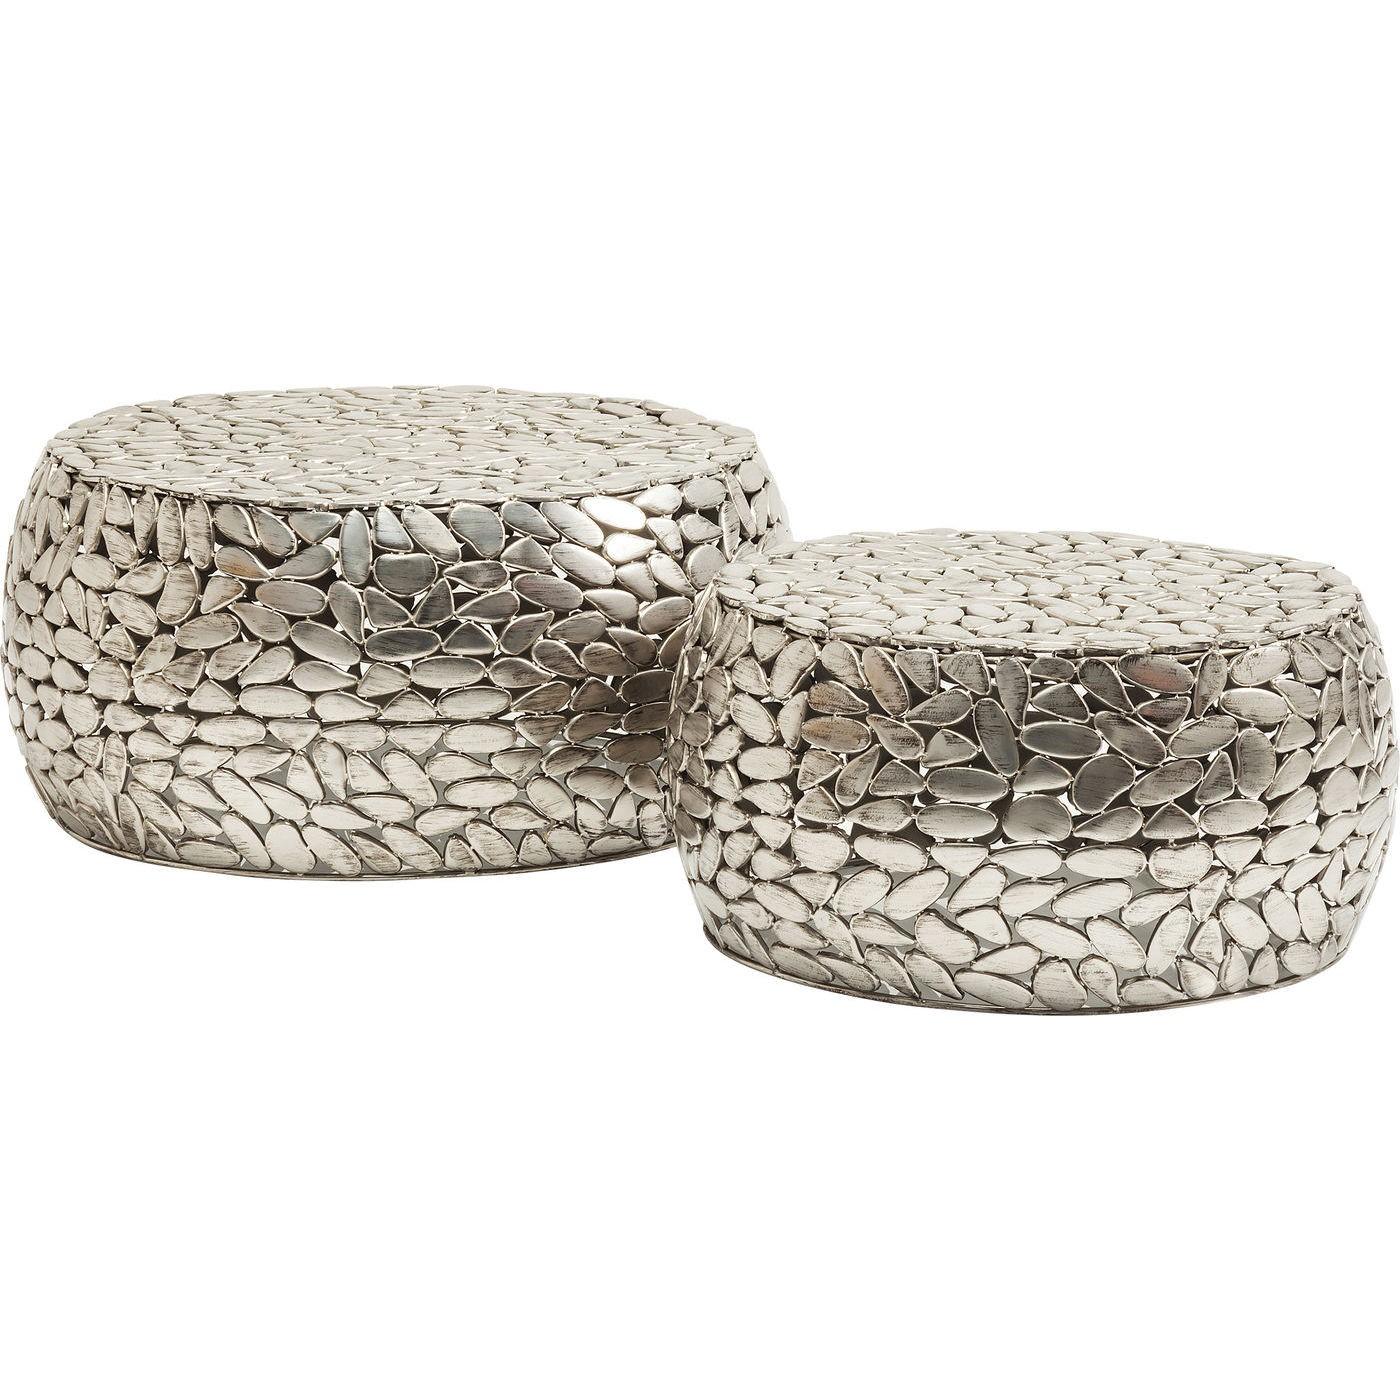 2 tables basses rondes en acier